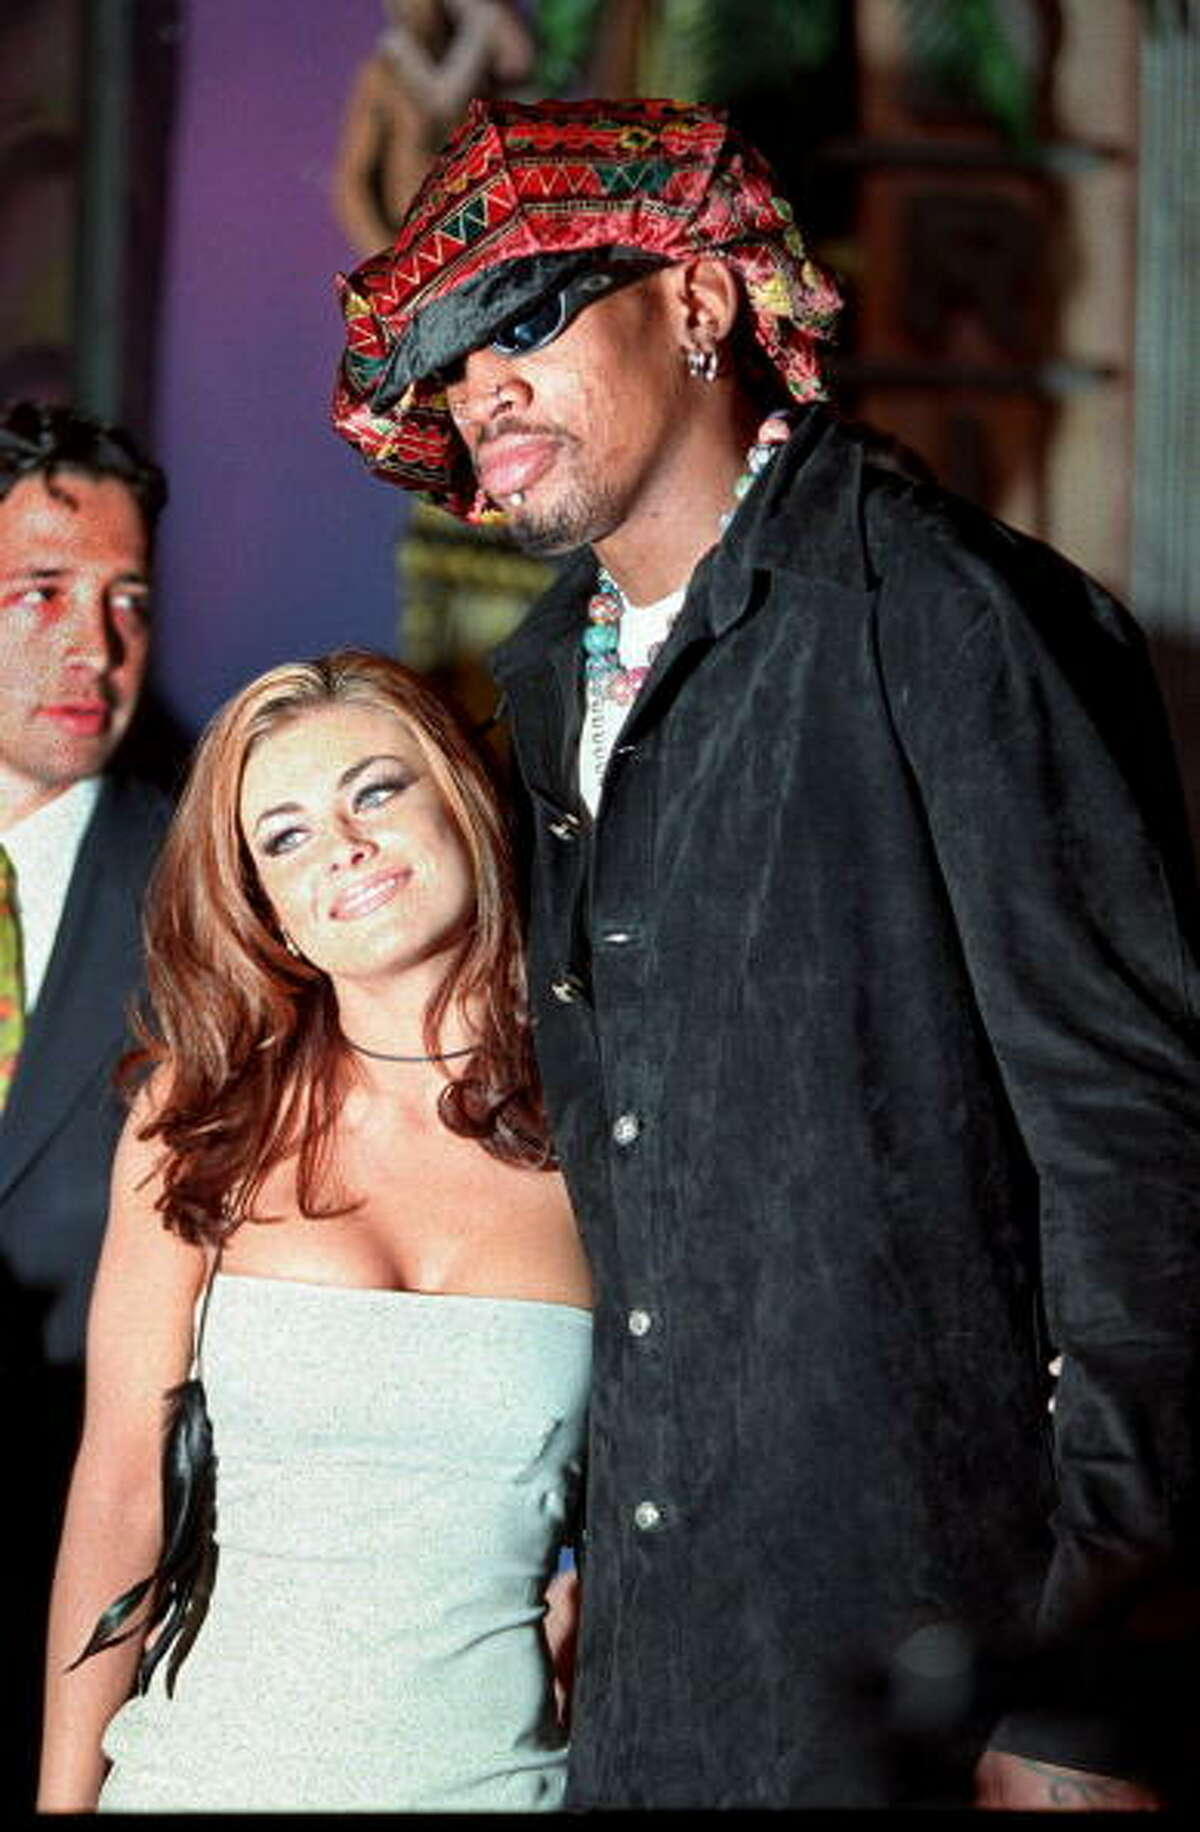 Carmen Electra and Dennis Rodman: 6 Days (1998)